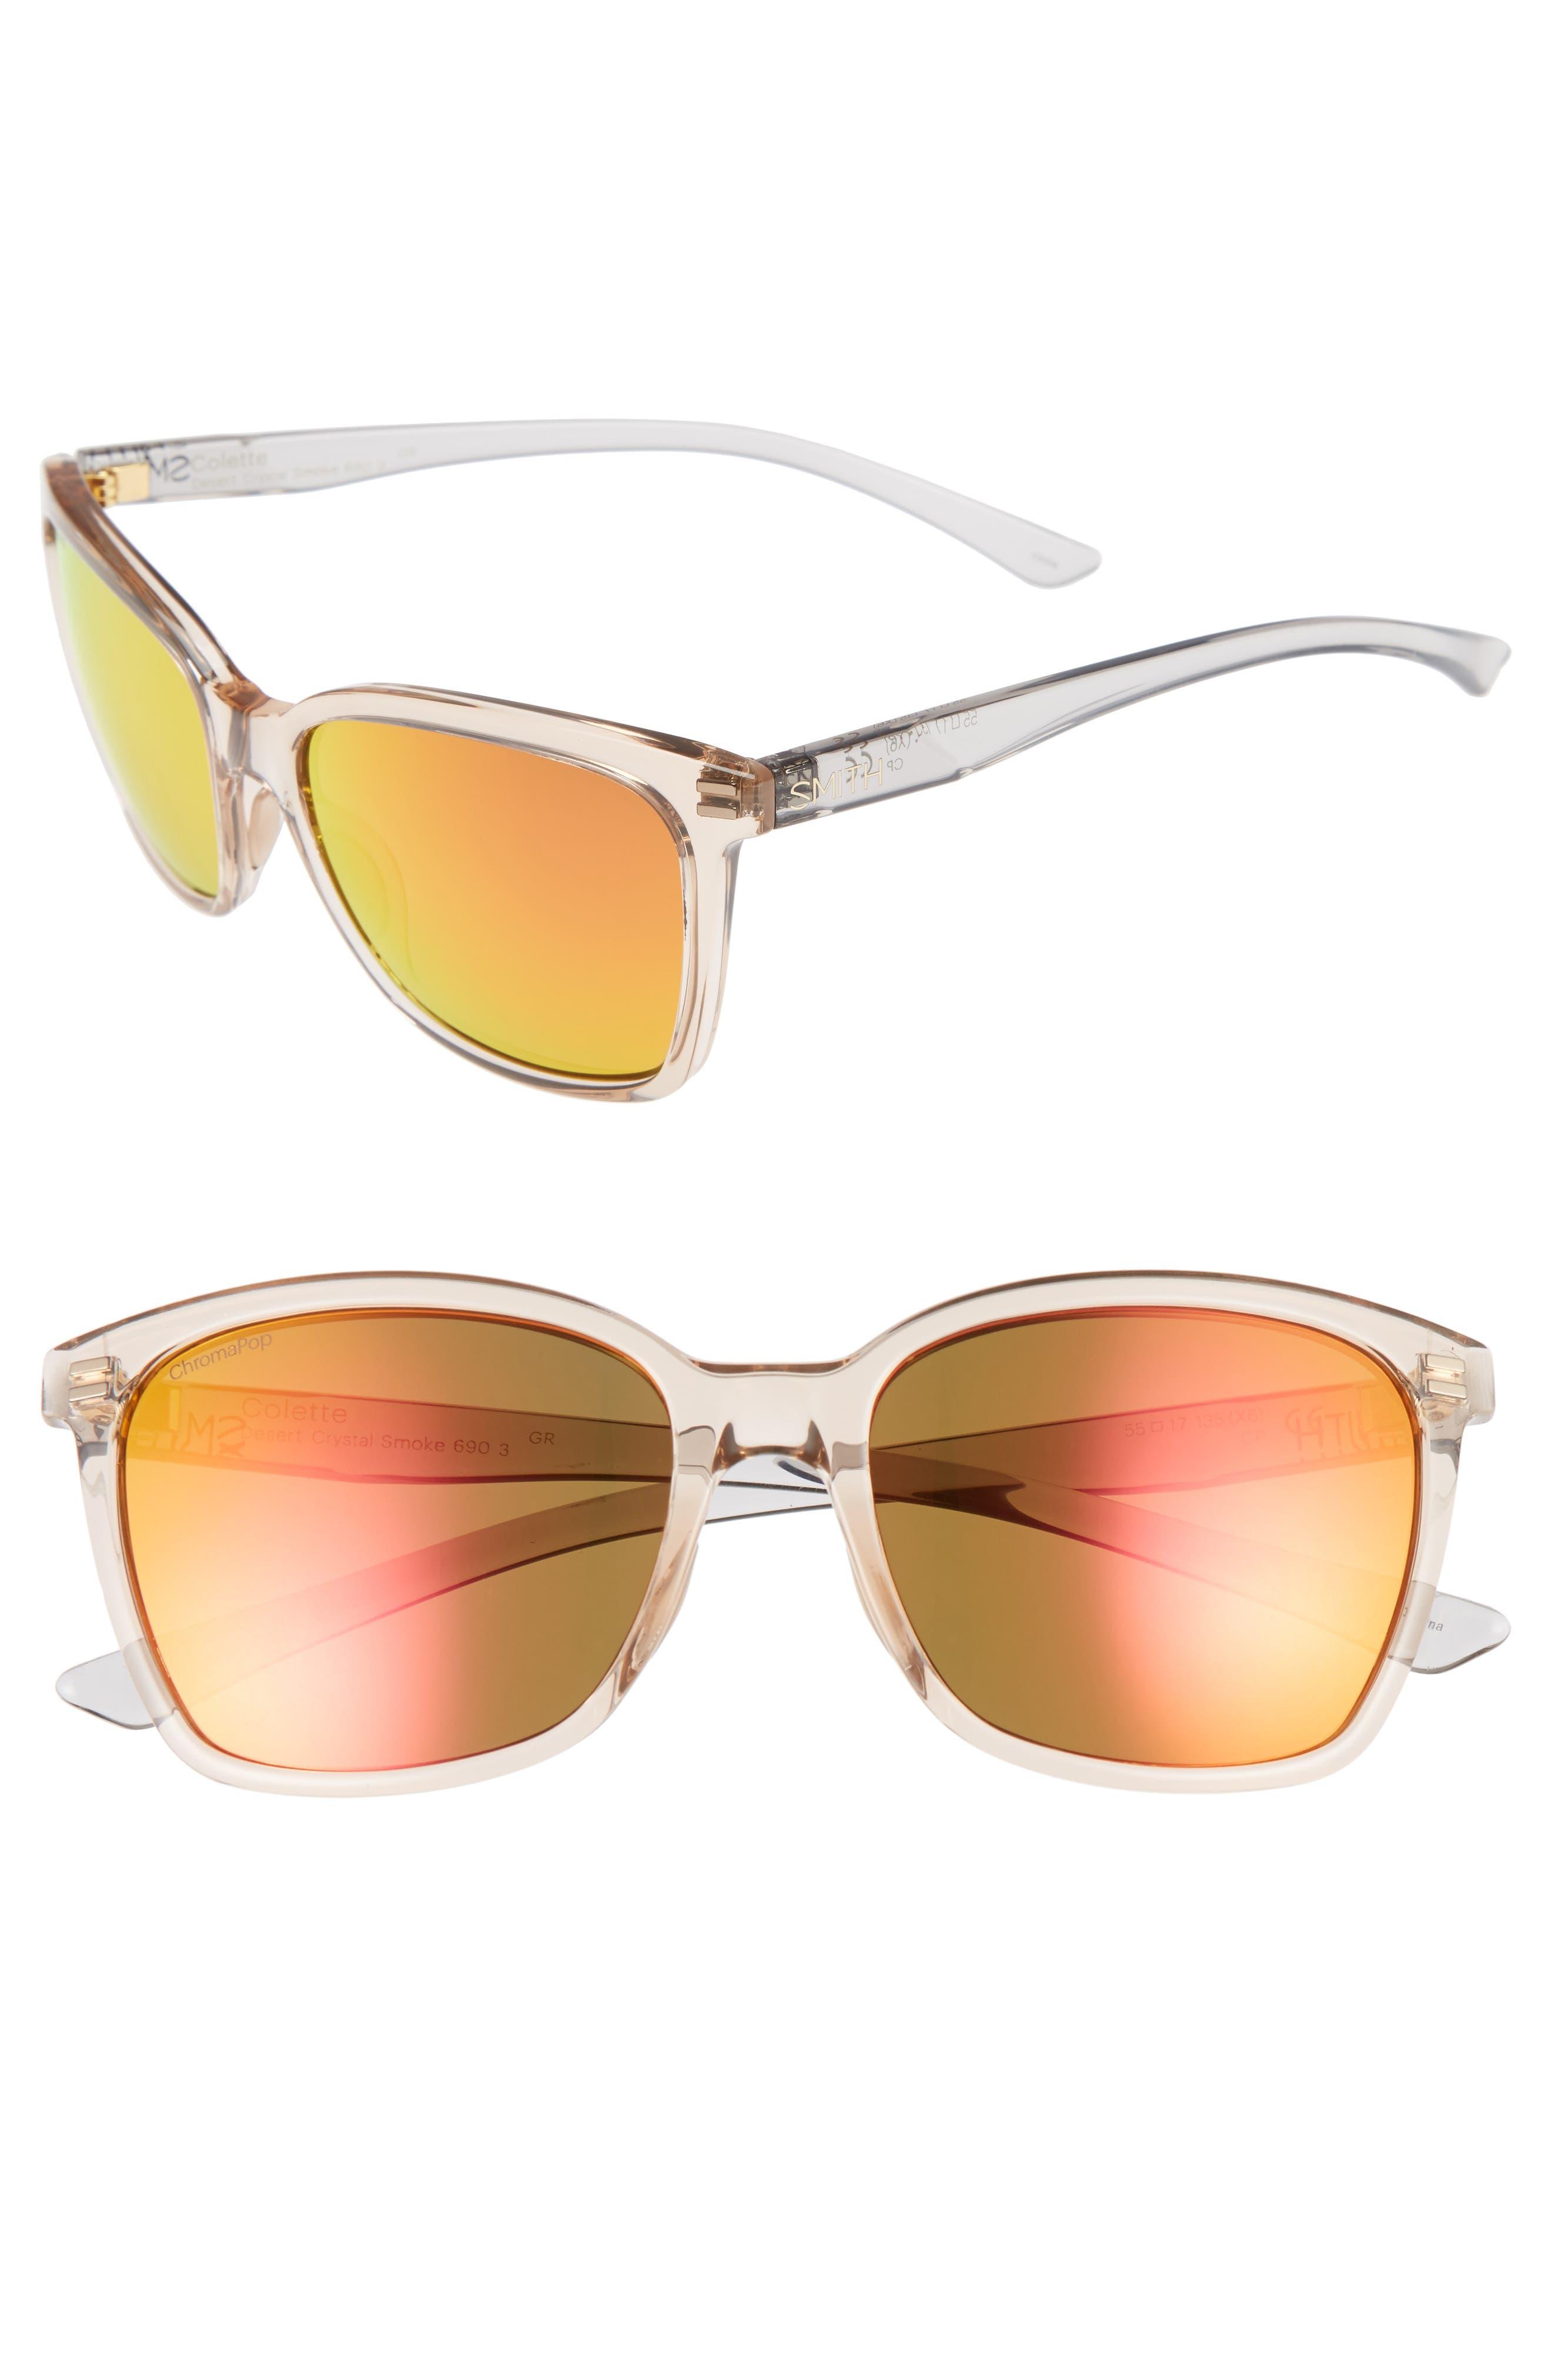 Alternate Image 1 Selected - Smith Colette Chromapop 55mm Polarized Mirrored Lens Sunglasses